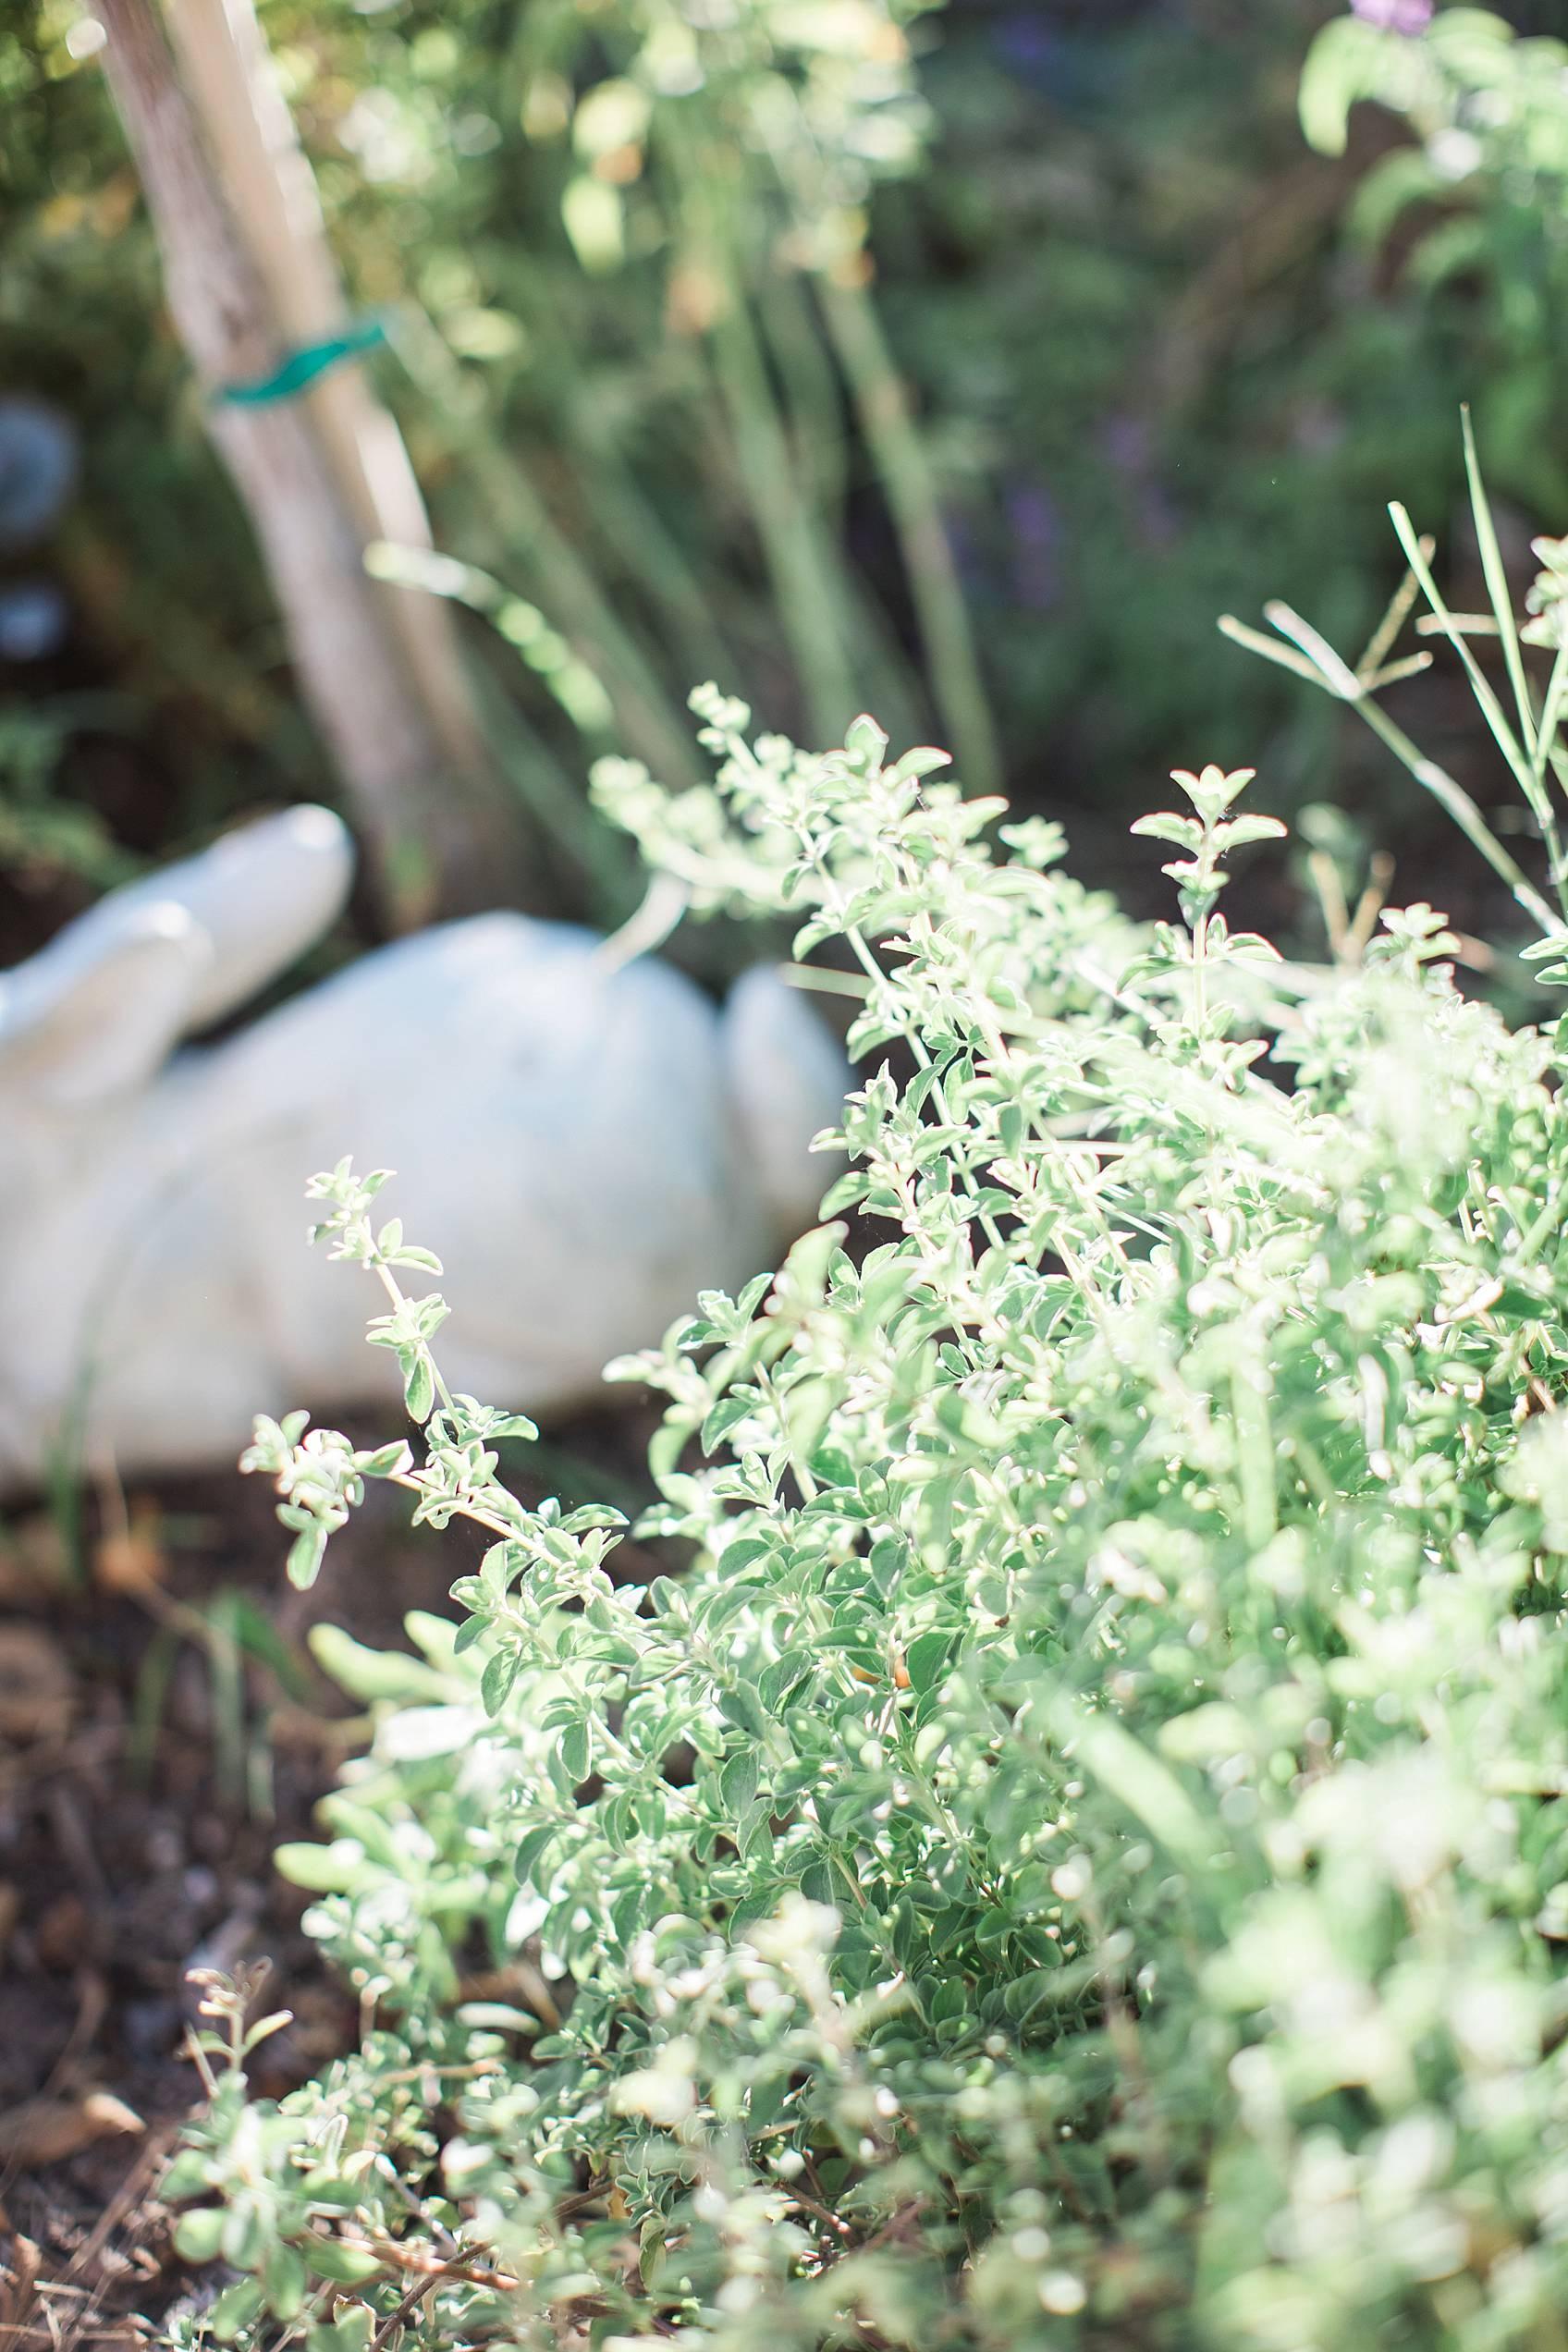 phoenix home garden blogger diana Elizabeth's garden Oregano growing in garden bed